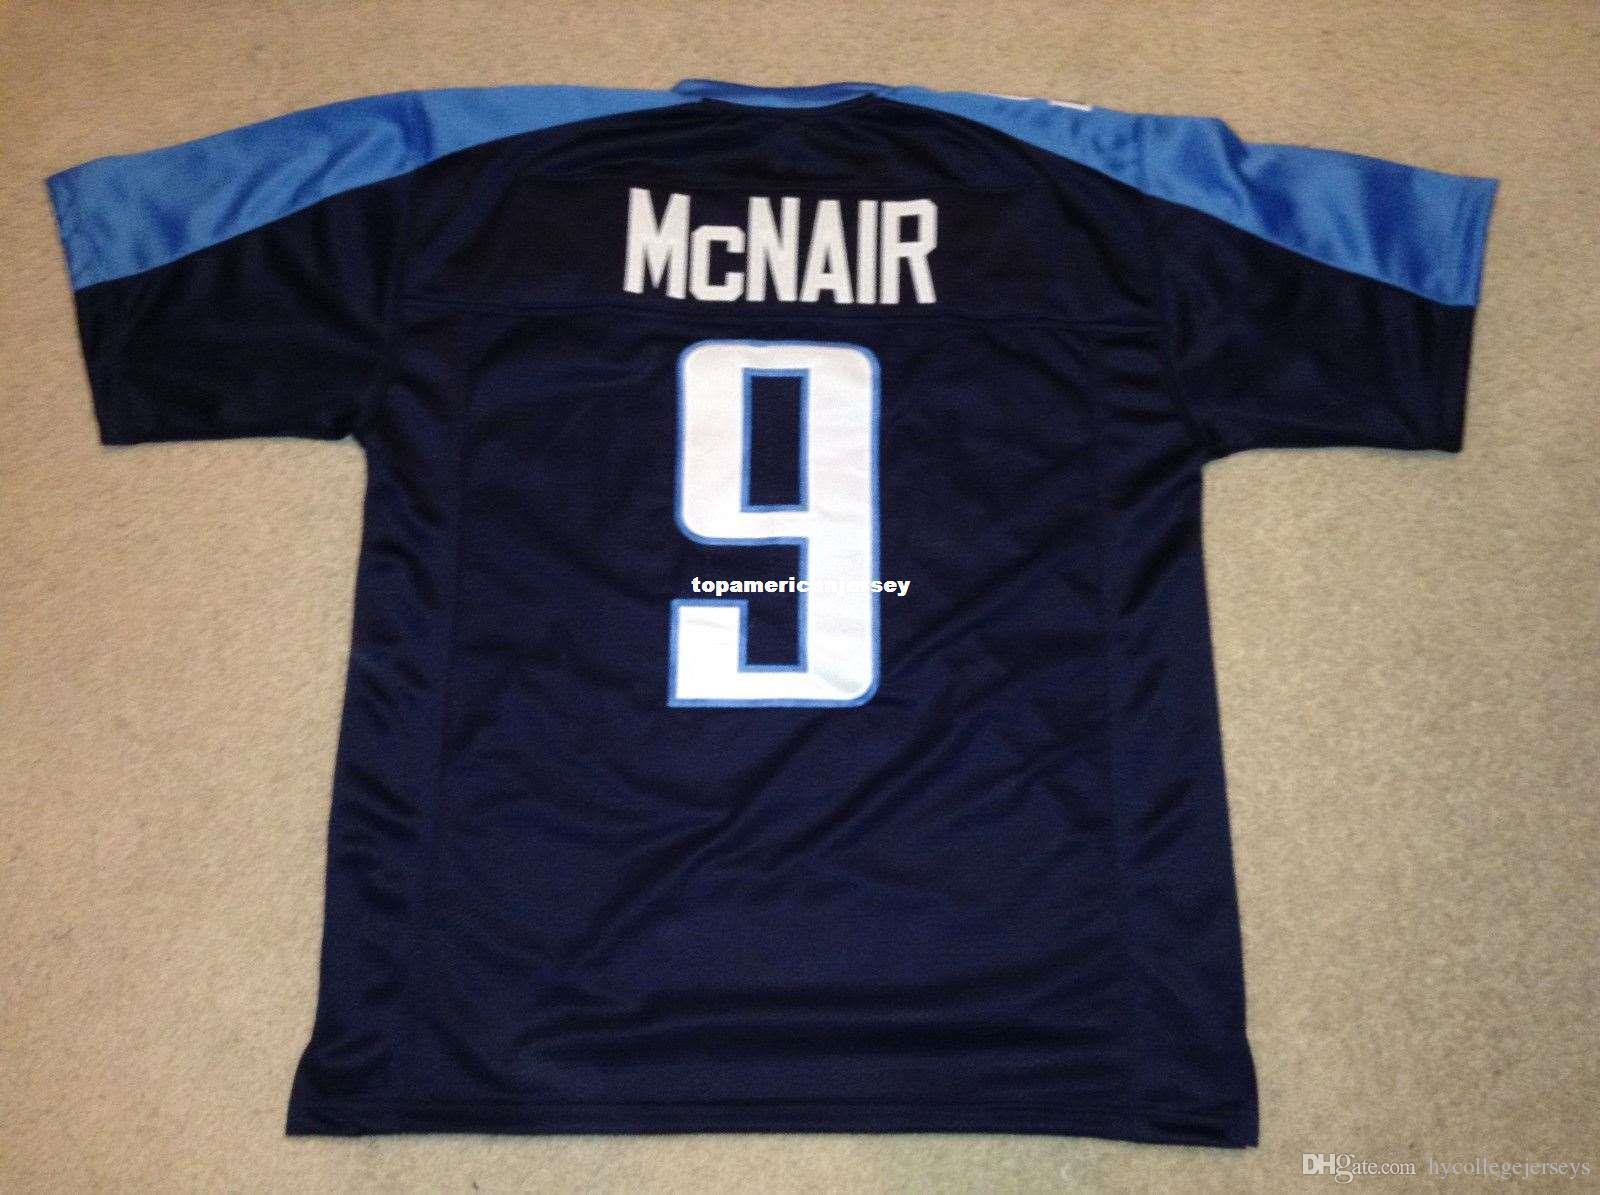 Billig retro benutzerdefinierte genäht genäht # 9 steve mcnair blau mitchell ness jersey top s-5xl, 6xl männer football jerseys rugby